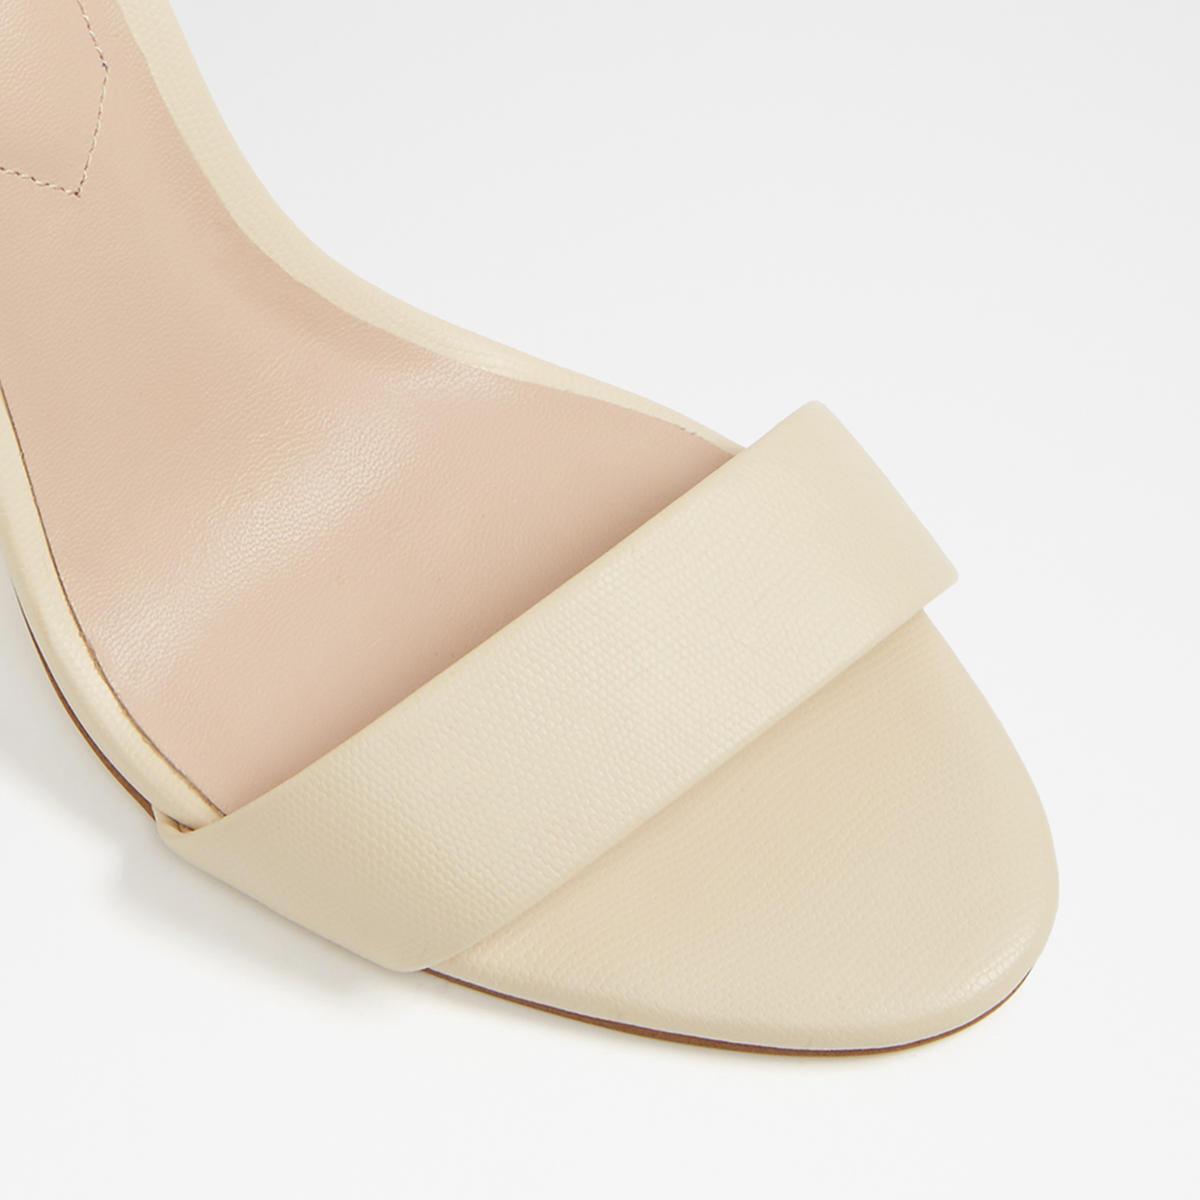 bacbfc804150 Camy Bone Misc. Women s Sandals